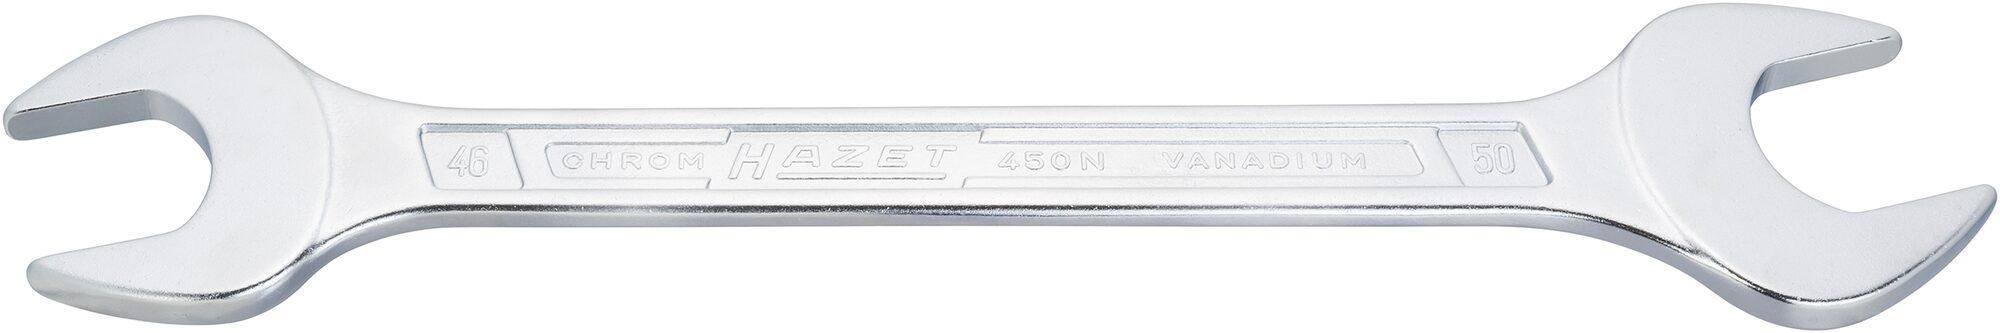 HAZET Doppel-Maulschlüssel 450N-36X41 ∙ Außen-Sechskant Profil ∙ 36 x 41 mm